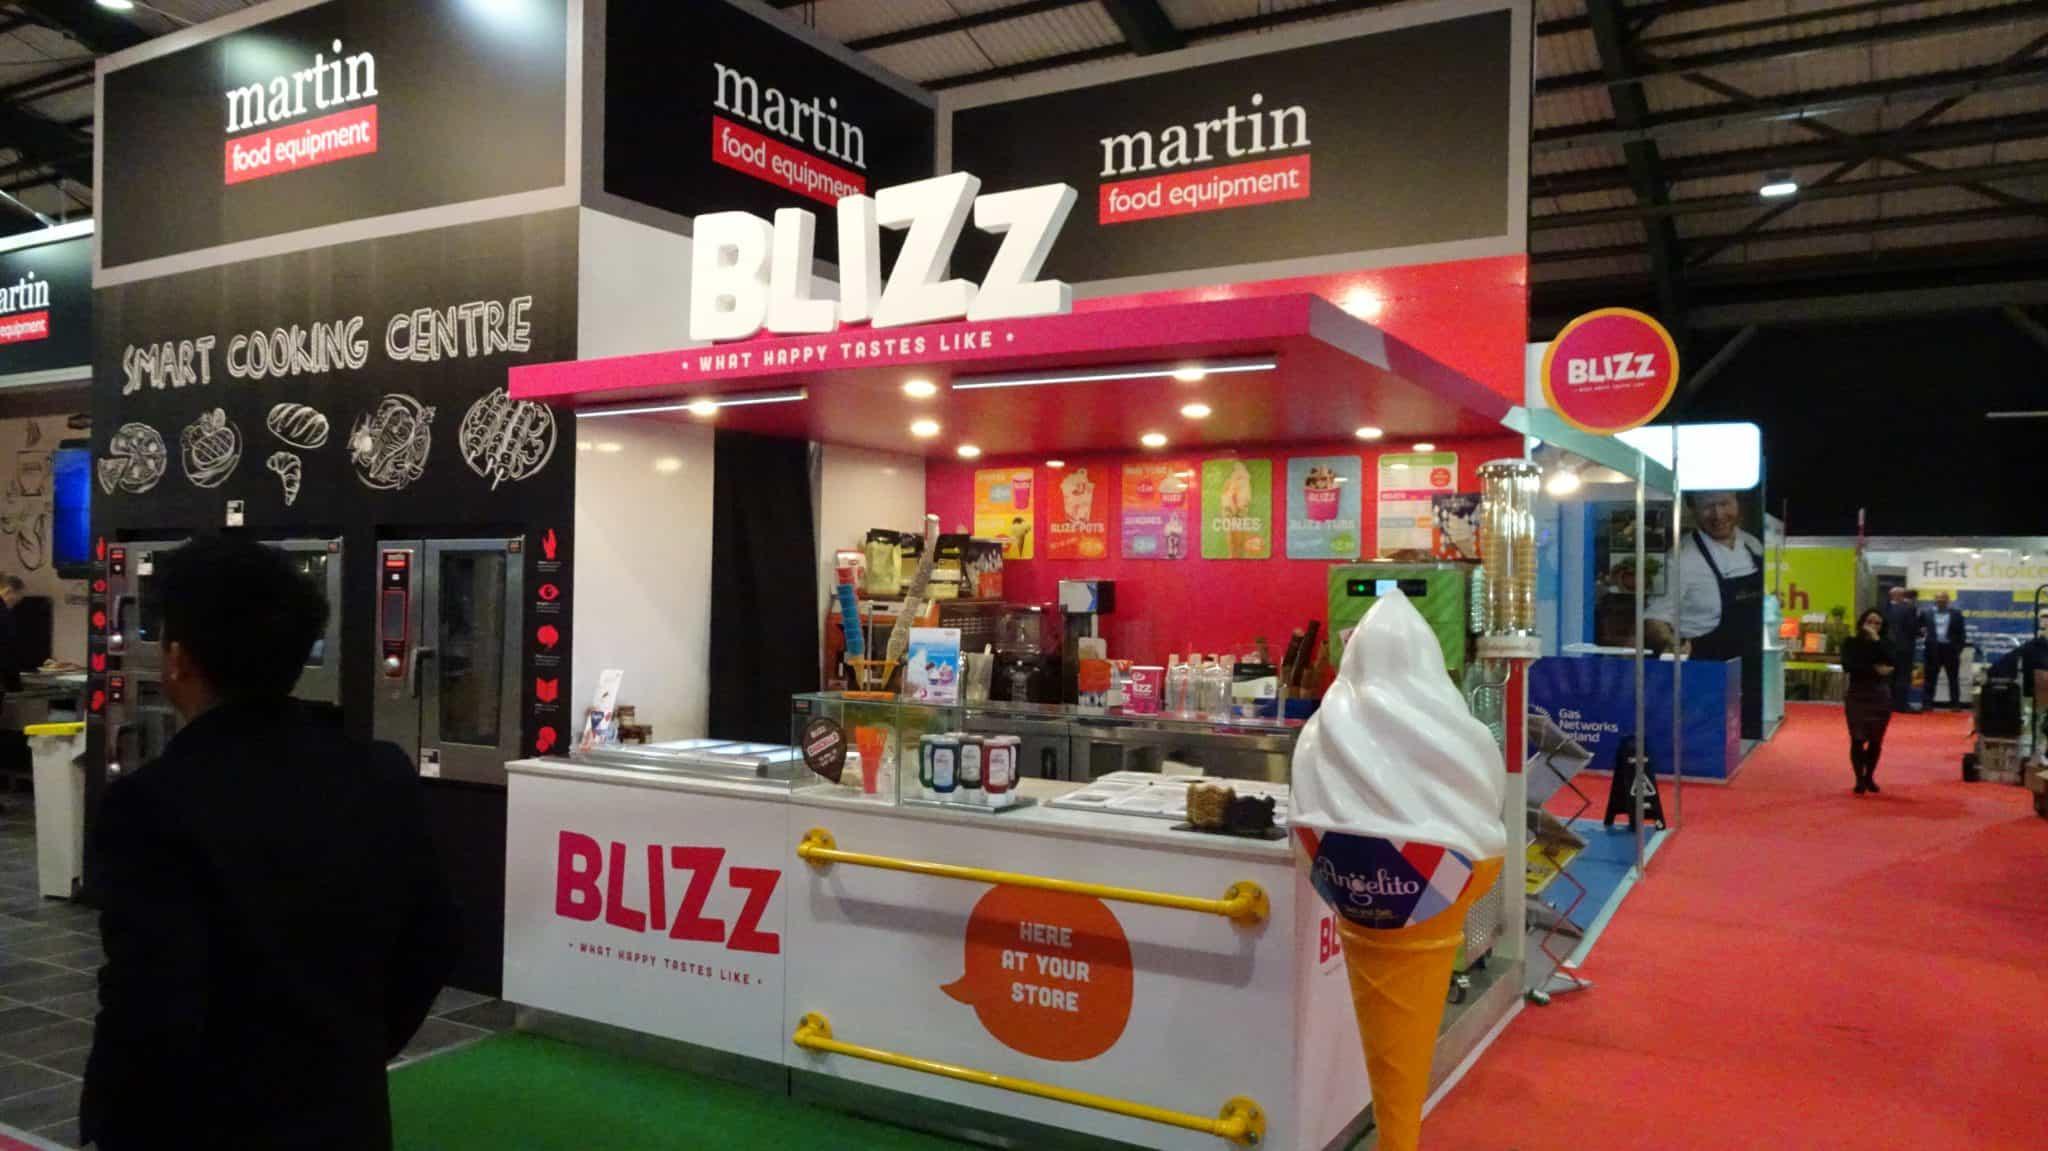 Martin Food Equipment DSC00122 Catex 2017 Events